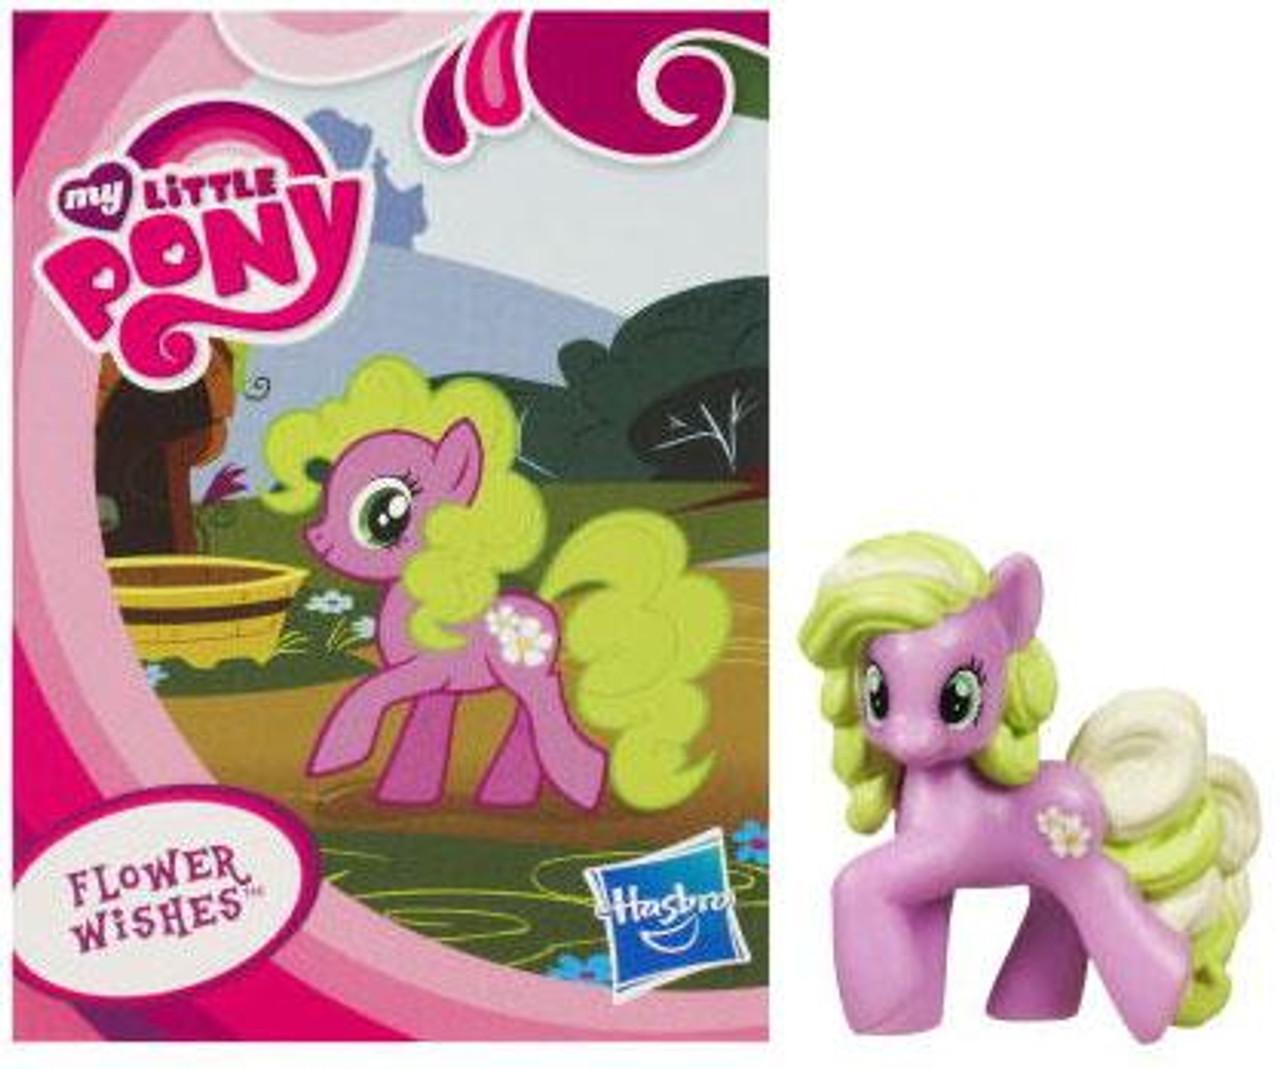 My Little Pony Flower Wishes 2-Inch PVC Figure